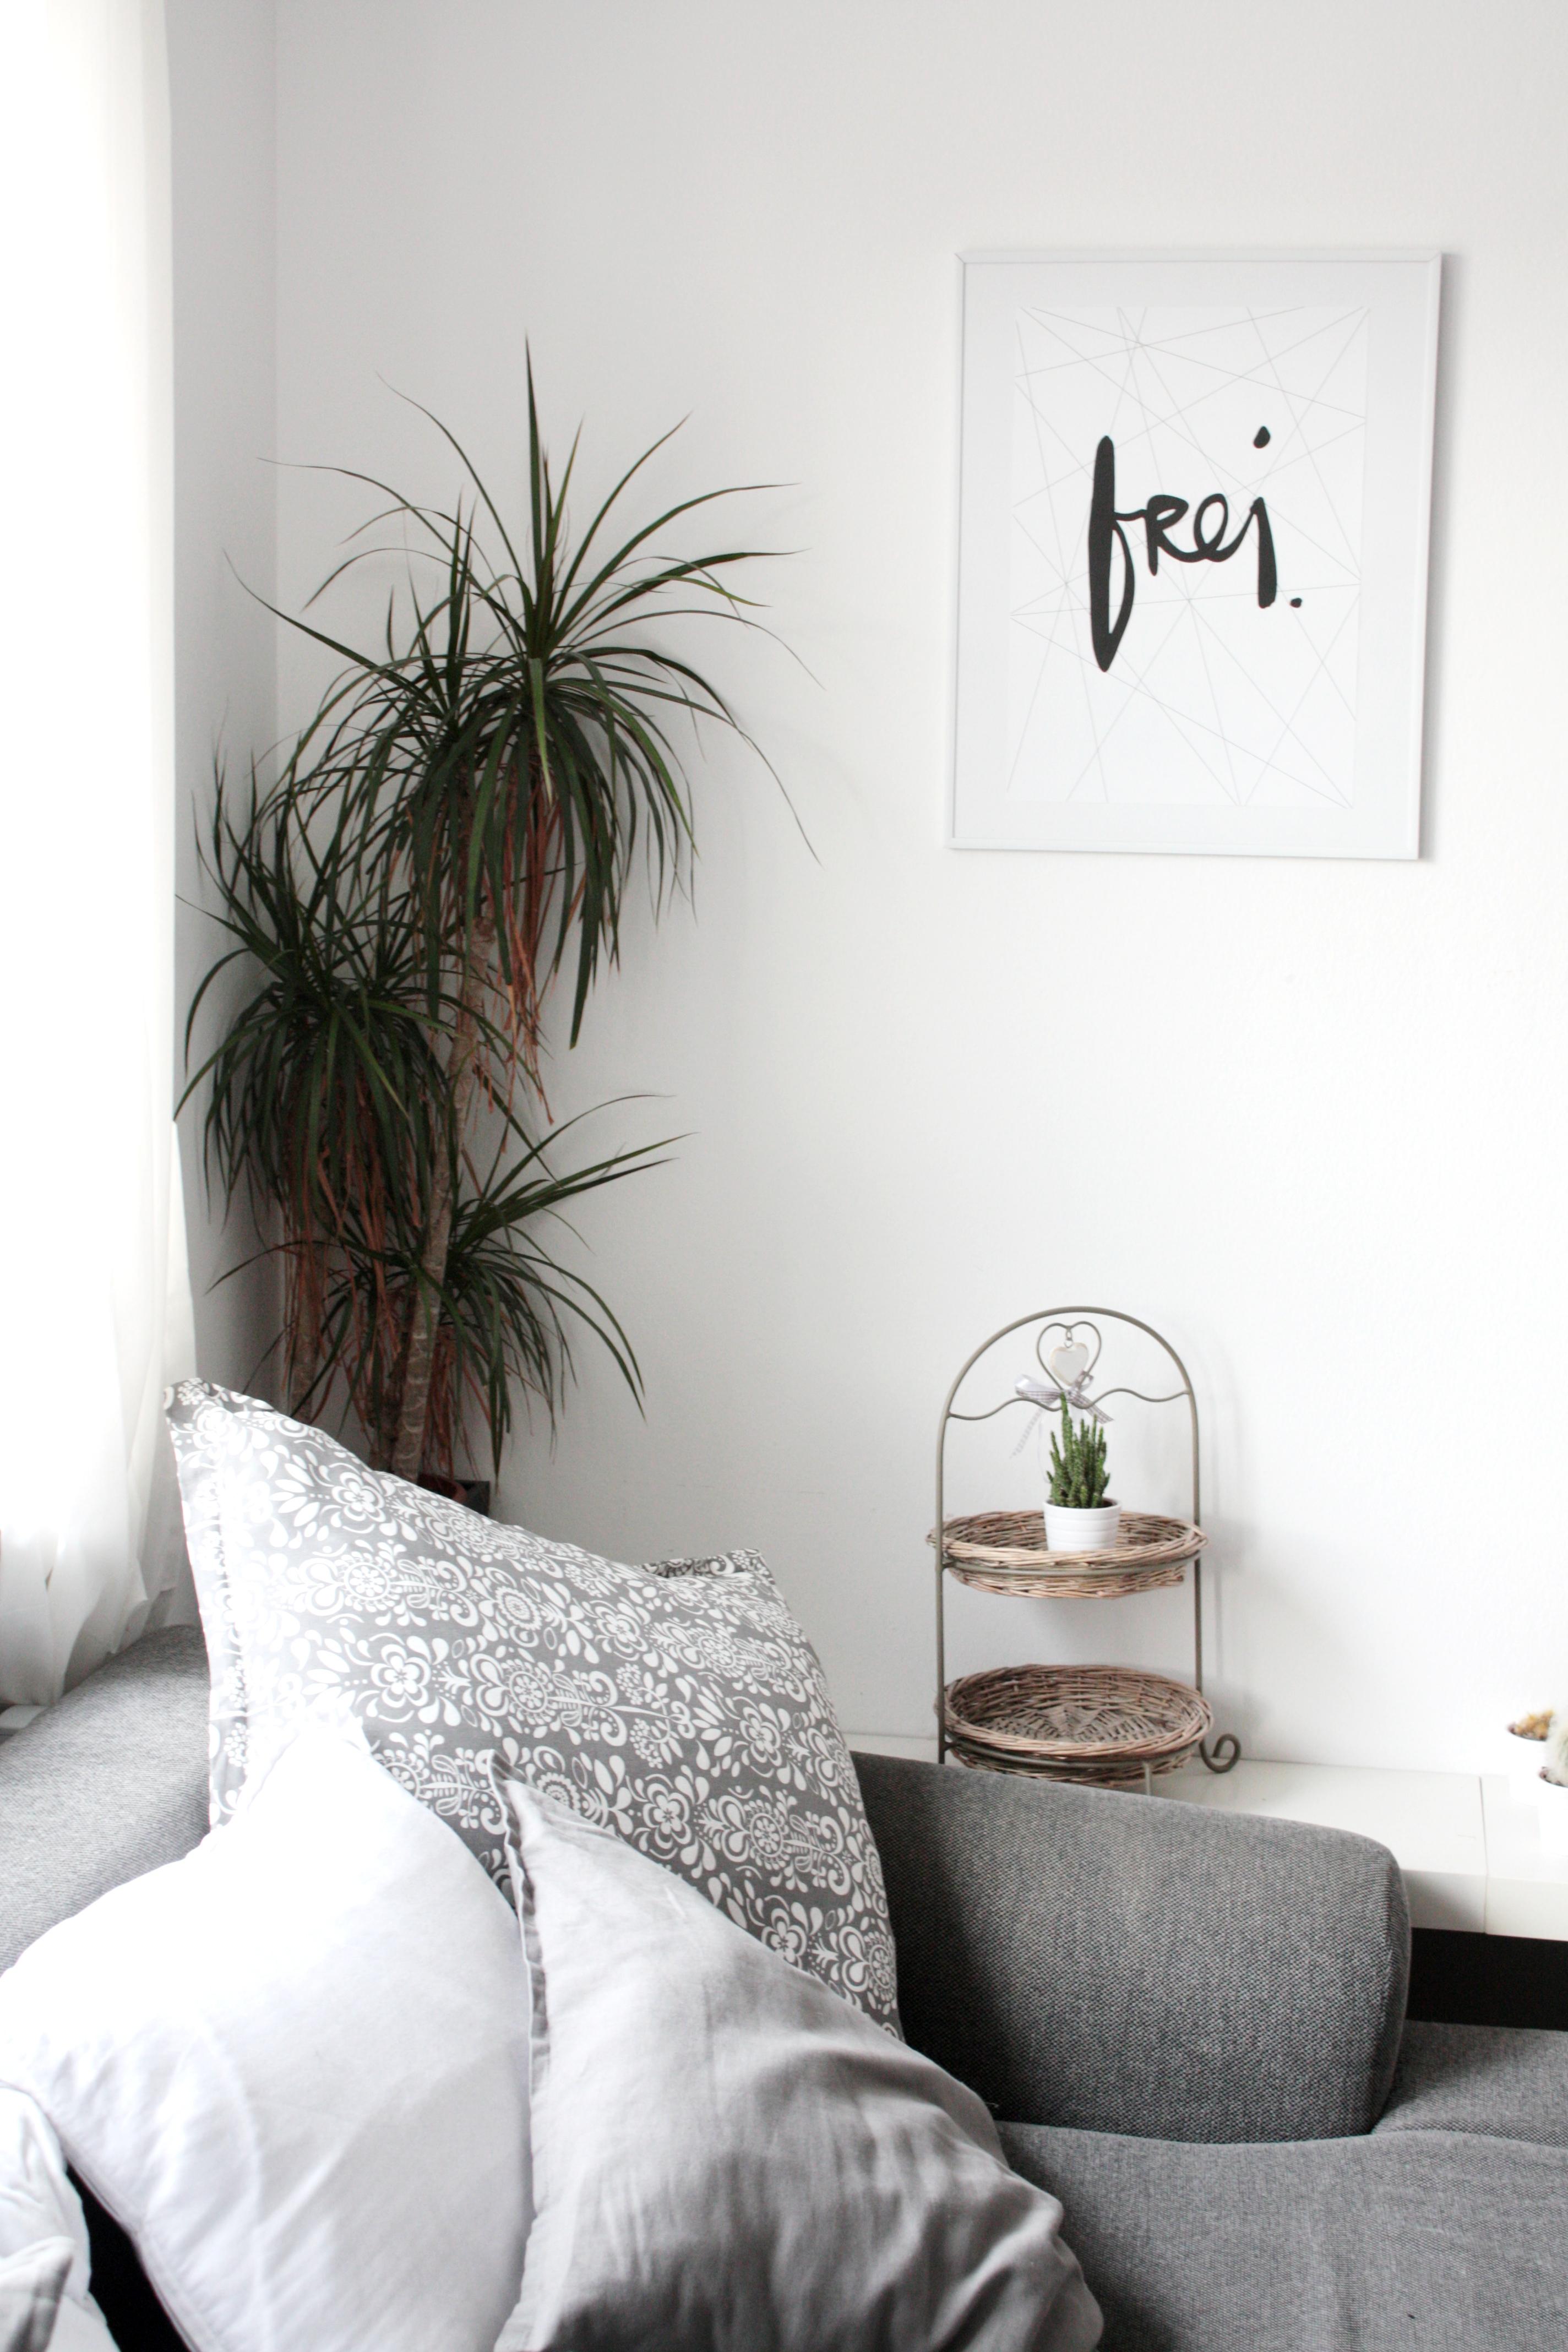 mein liebstes winterhei getr nk giveaway rosy grey diy blog lettering m nchen. Black Bedroom Furniture Sets. Home Design Ideas